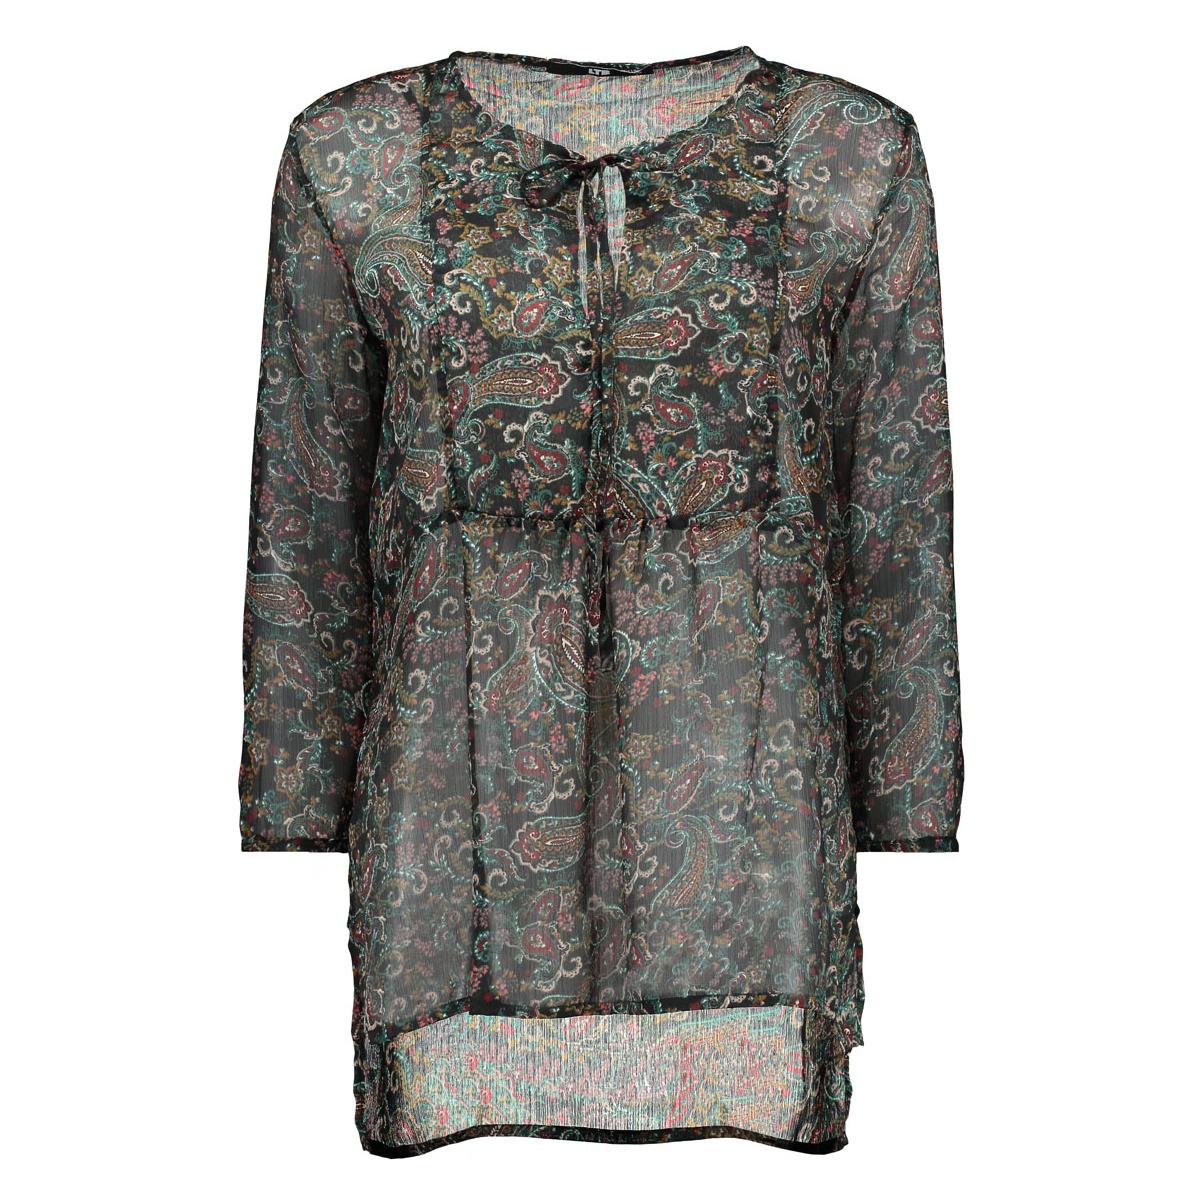 111745087.43433 ltb blouse black